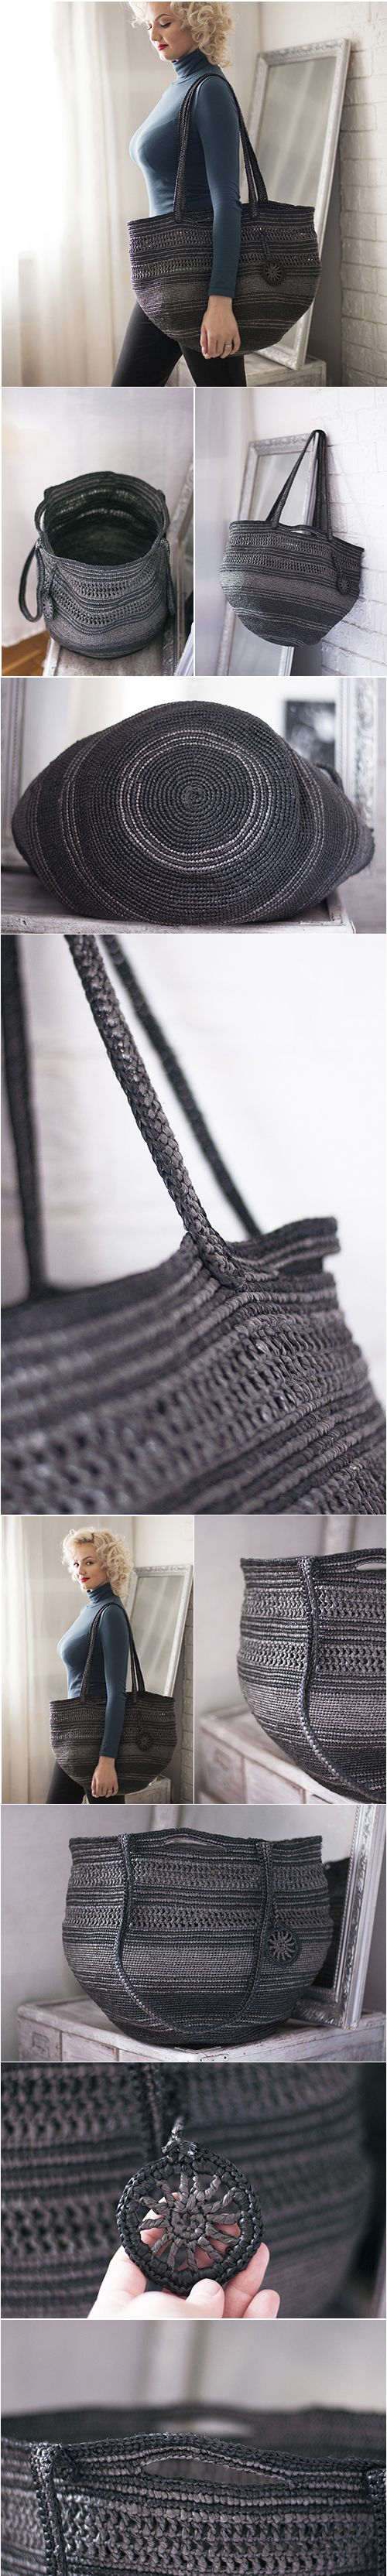 Rustic Plarn Tote Bag, Big Large Eco Friendly Upcycled, Silver Holdall, Black and Gray, Metalic Bag, Handbag Plarn Tote Bag, Crochet Tote, #frombabushkashop, upcycling, recycling